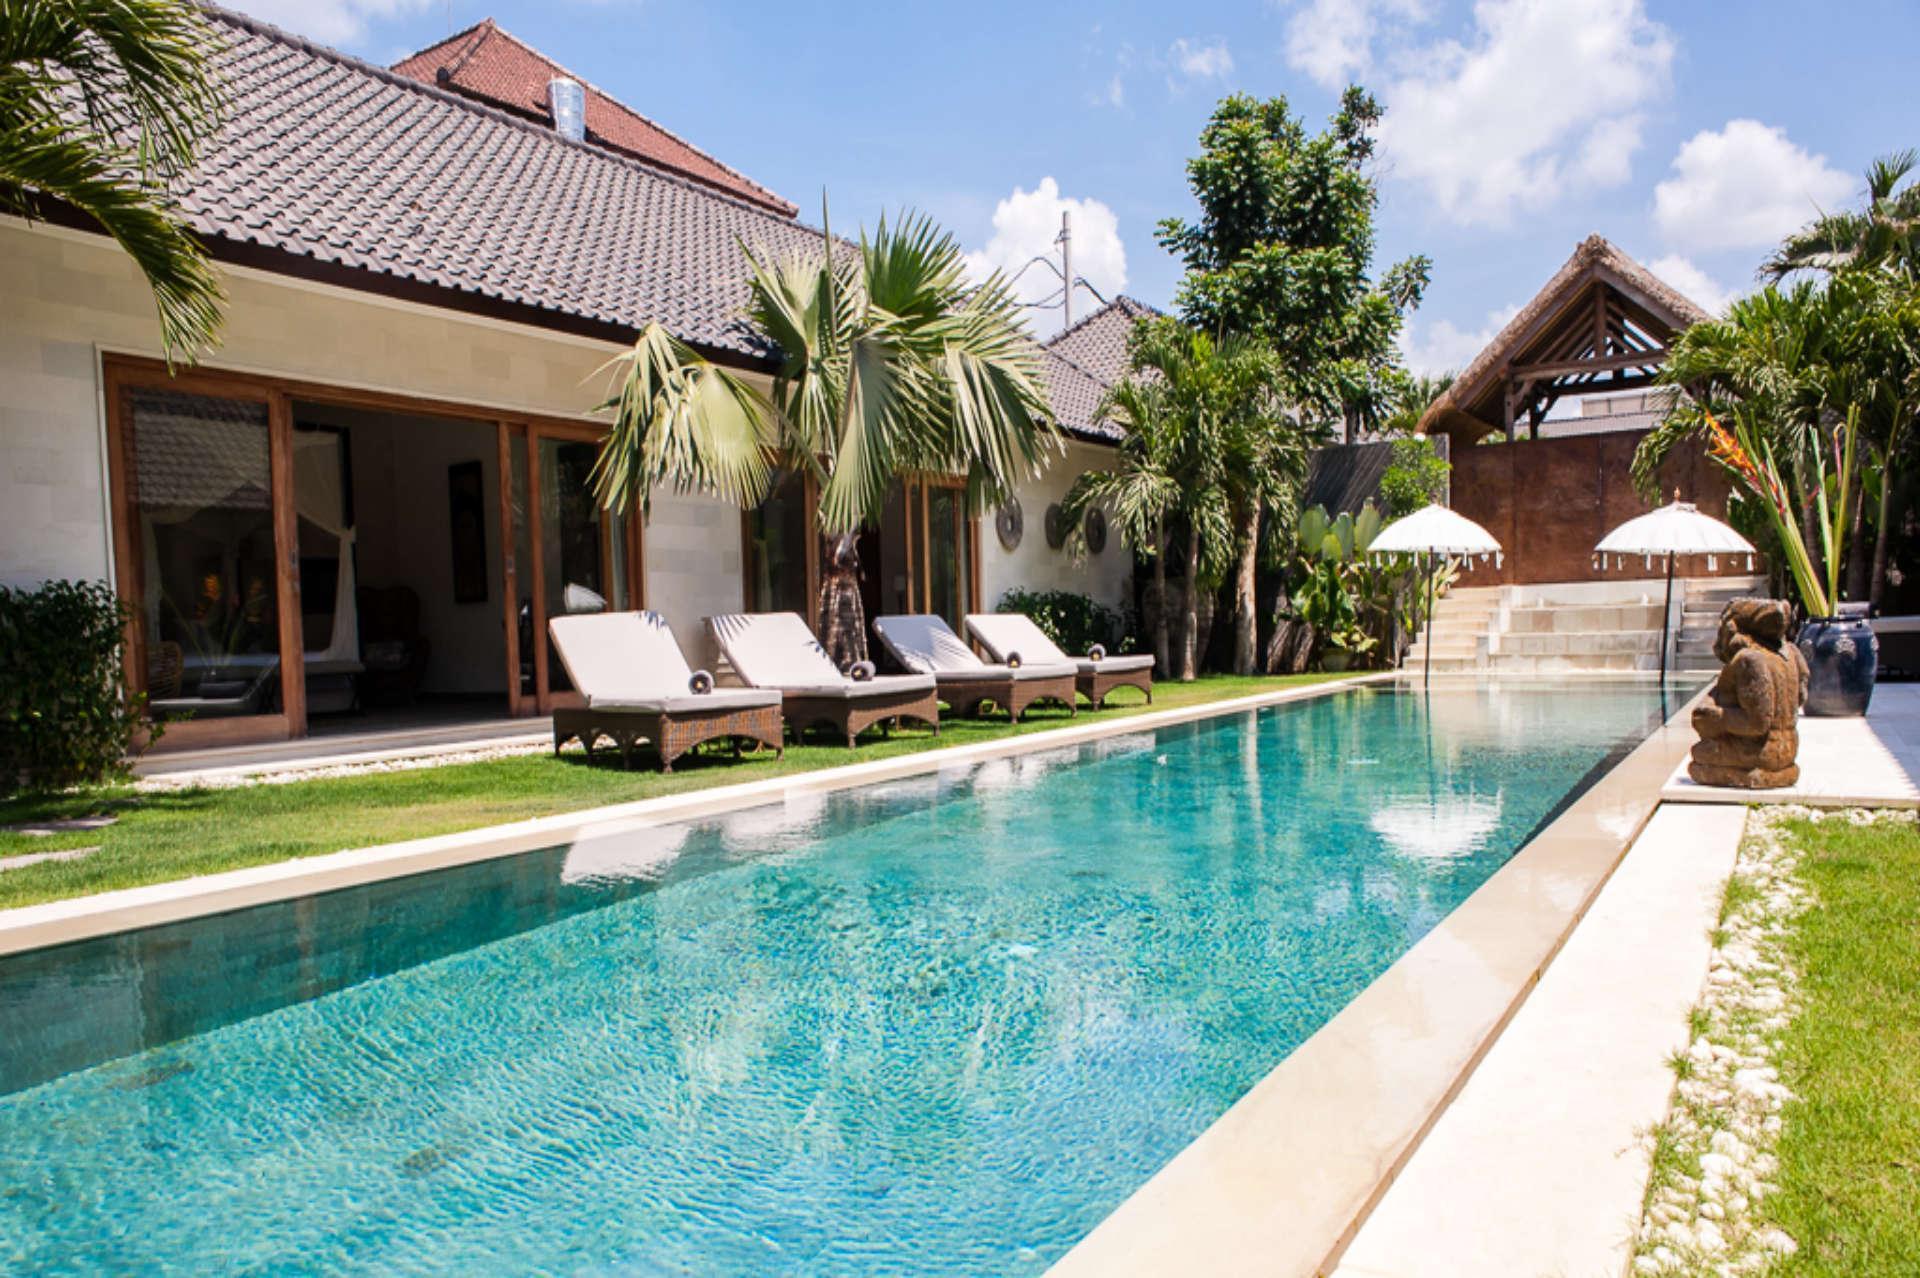 Imagine Your Family Renting a Luxury Holiday Villa Close to Seminyak's Main Attractions, Villa Bali